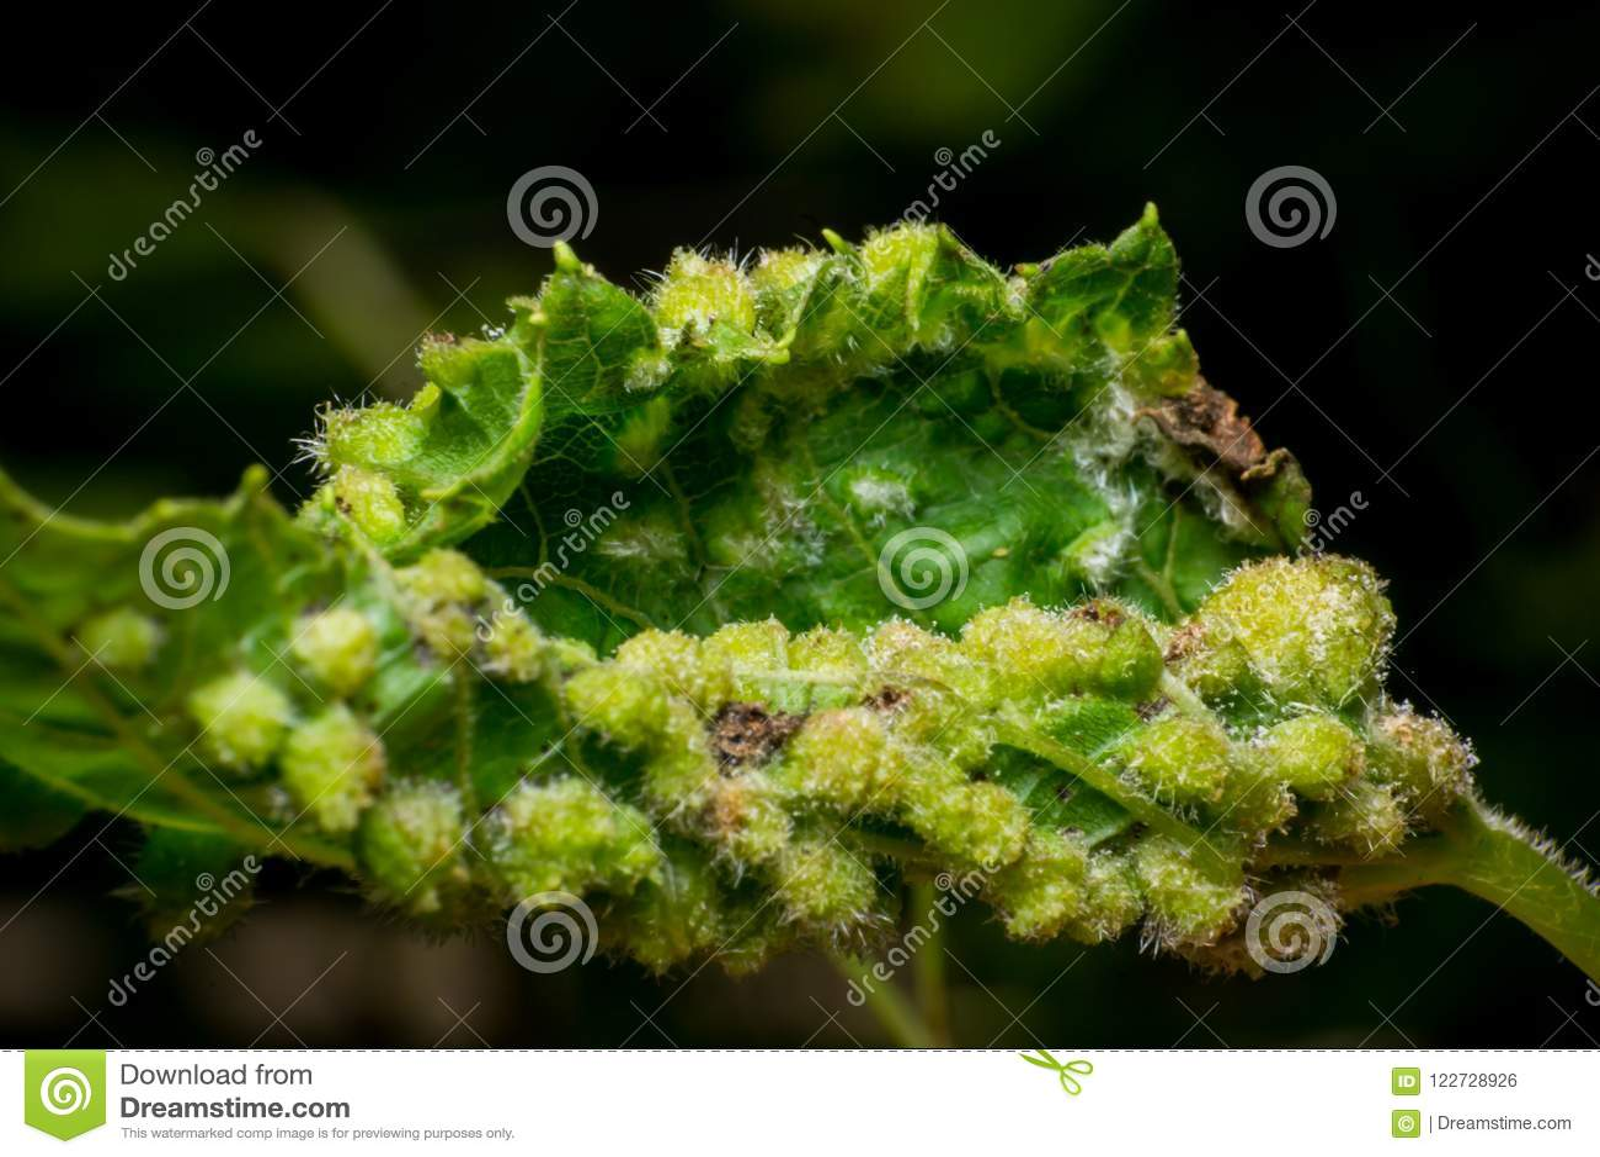 Phylloxera vastatrix, Daktulosphaira vitifoliae, vine disease